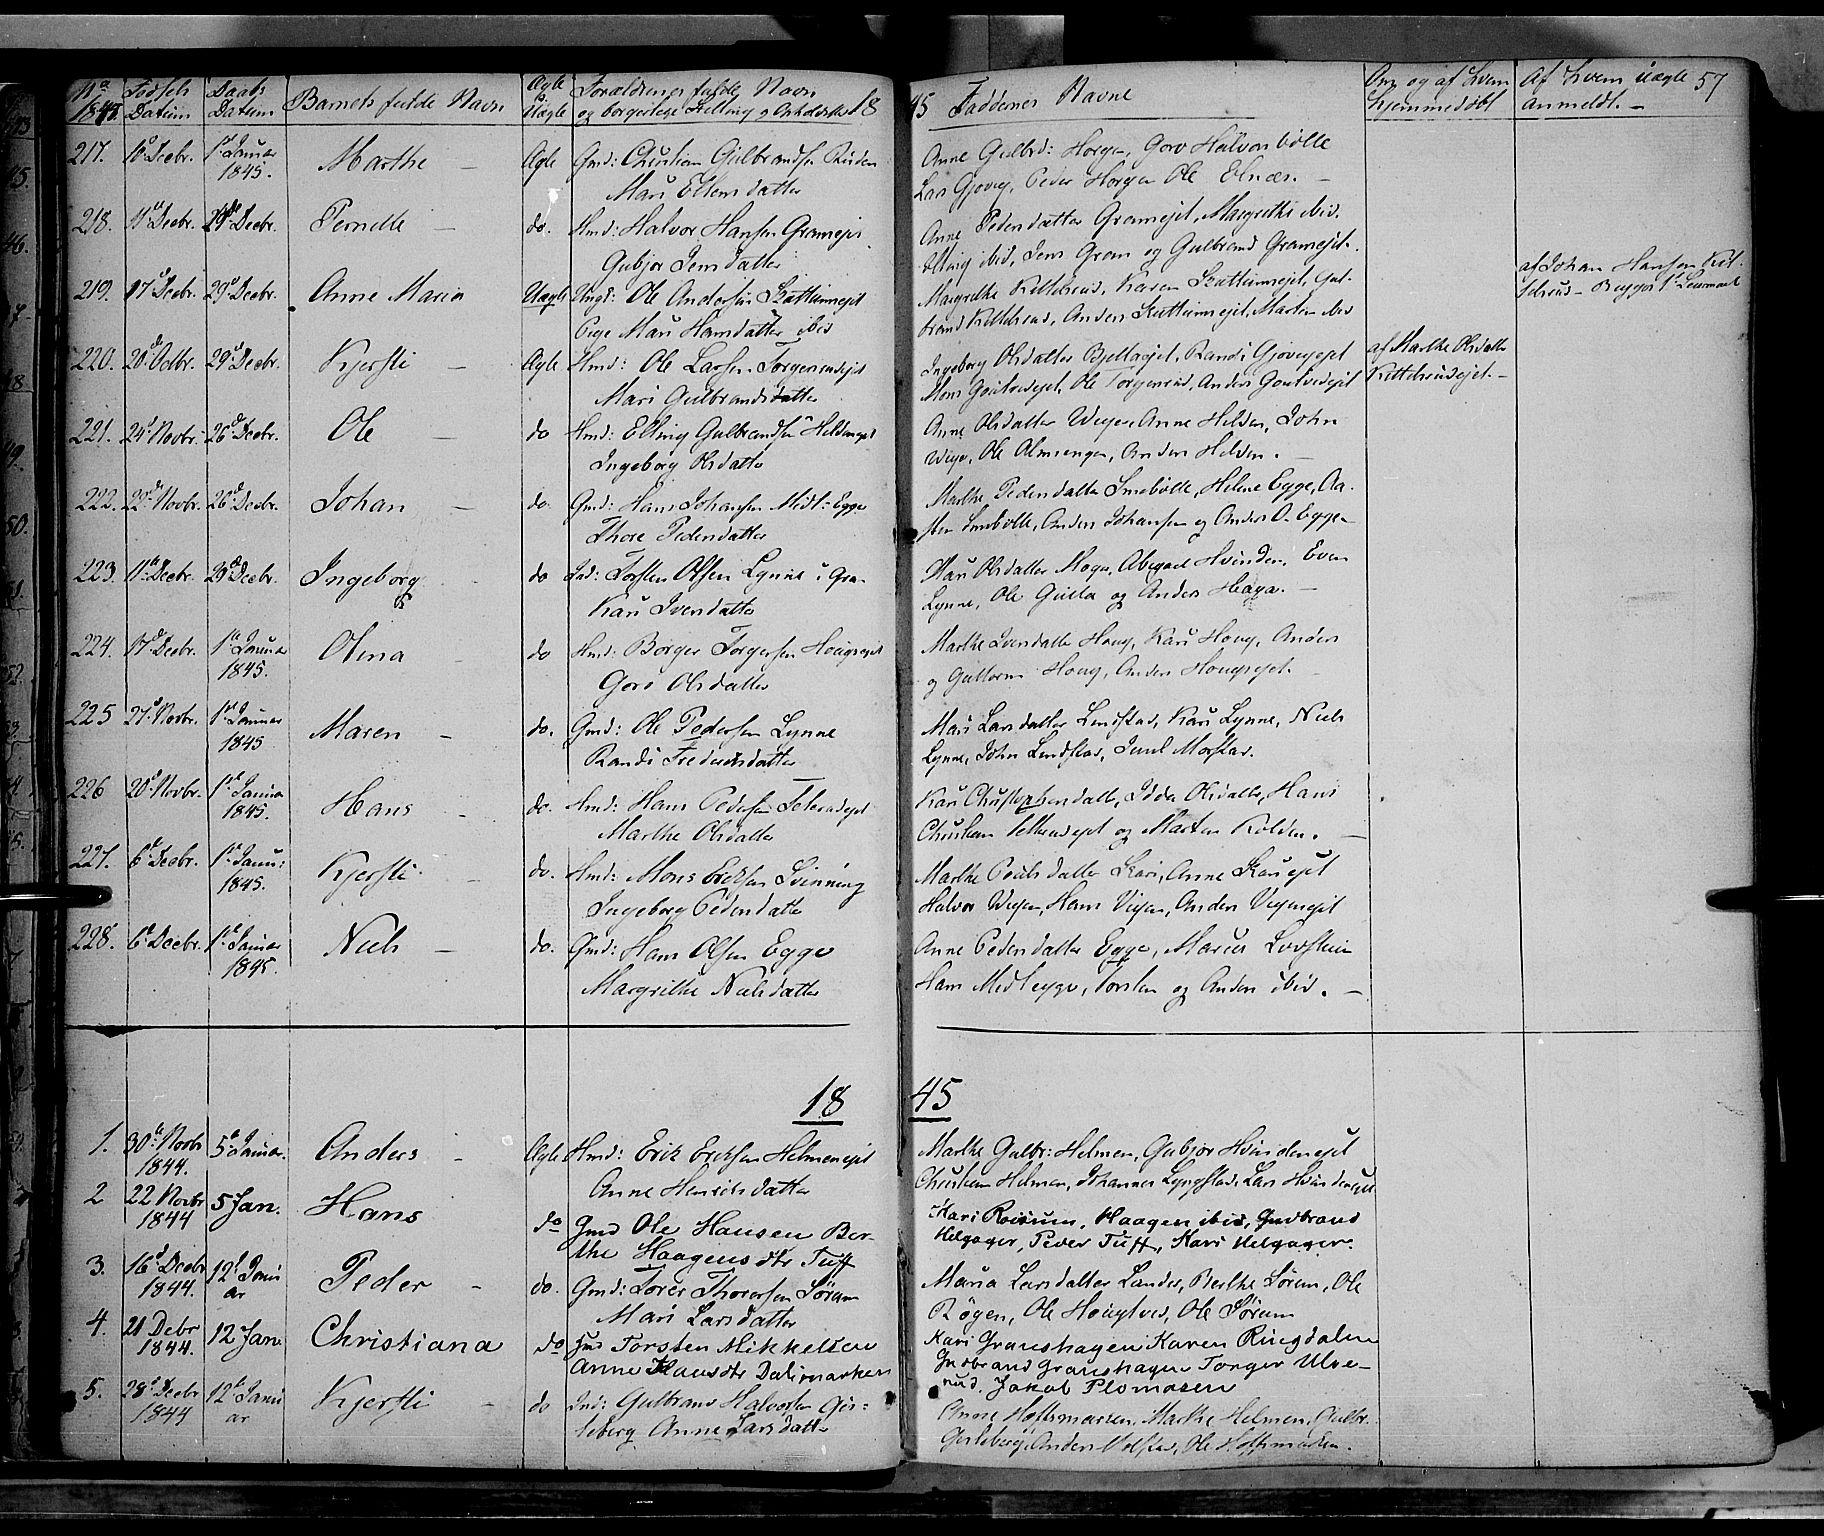 SAH, Gran prestekontor, Ministerialbok nr. 11, 1842-1856, s. 56-57